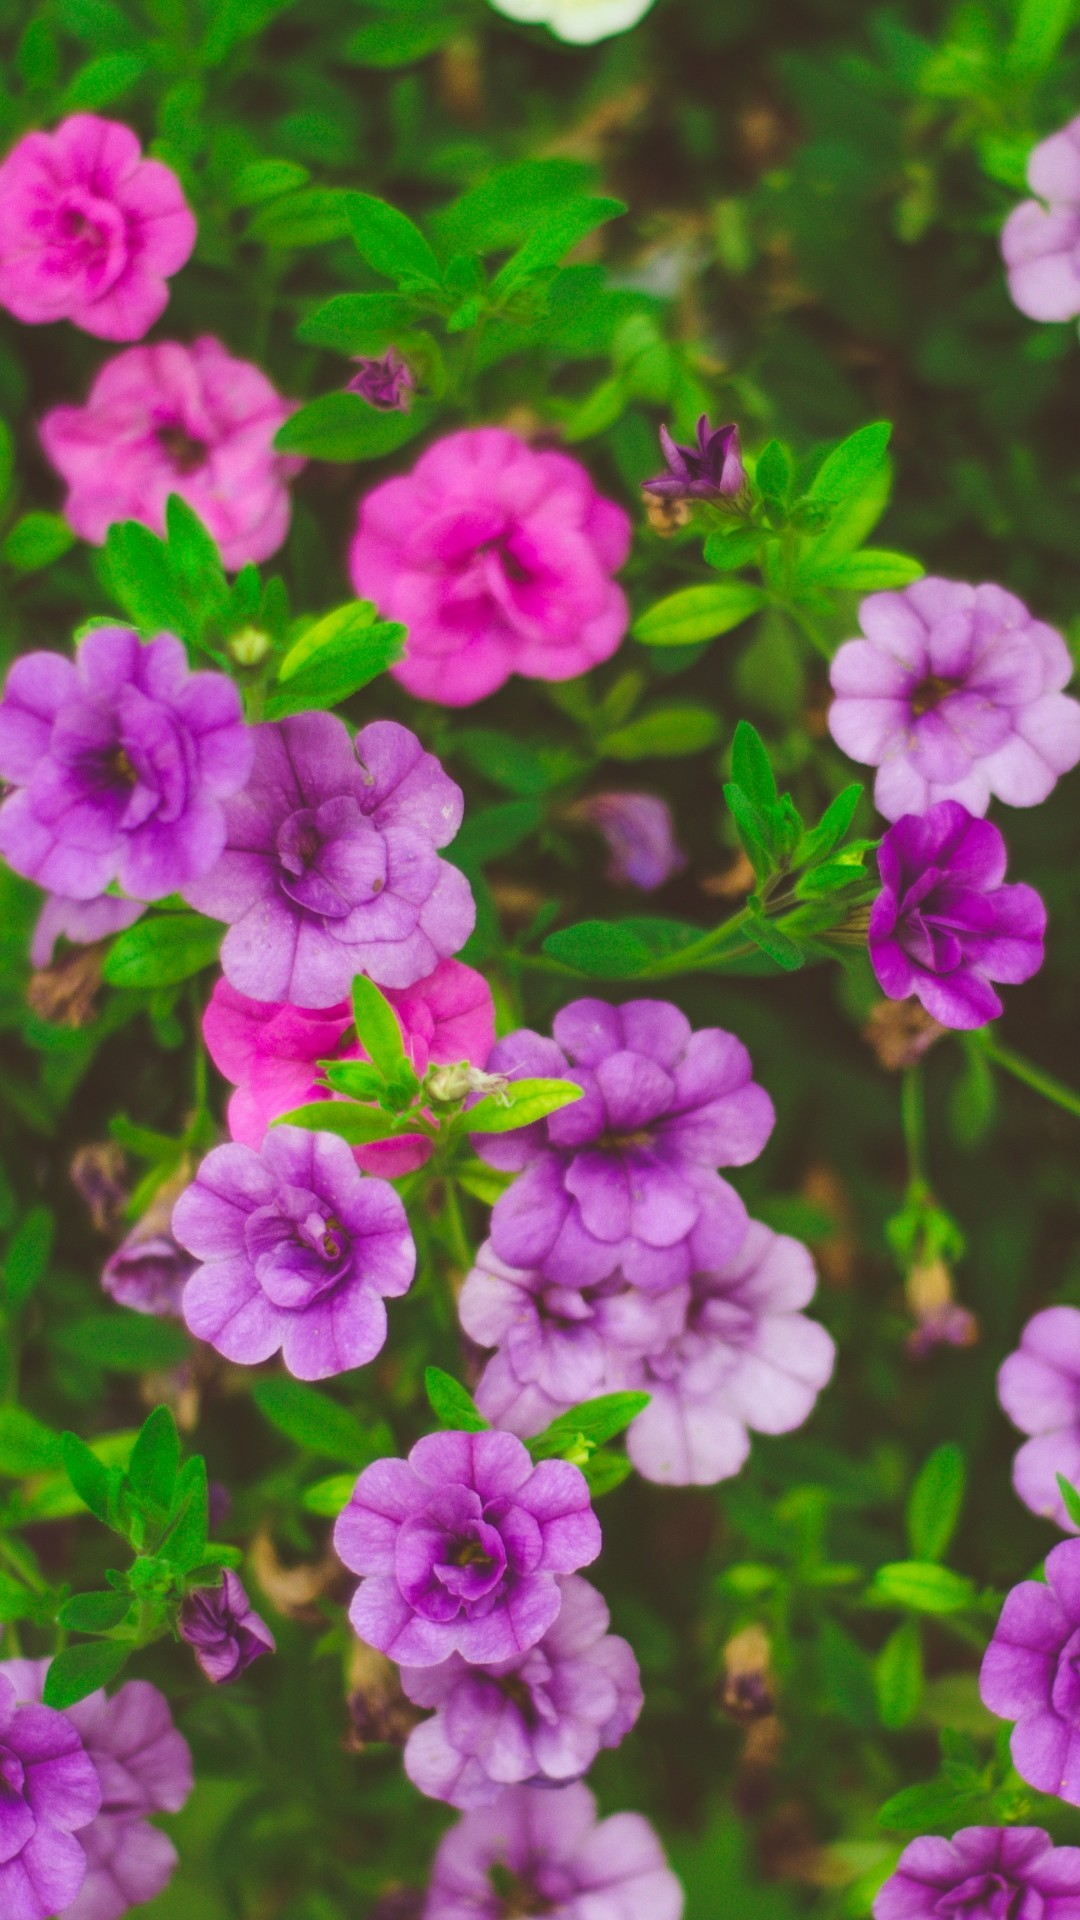 Free Purple Flowers phone wallpaper by fblairswife